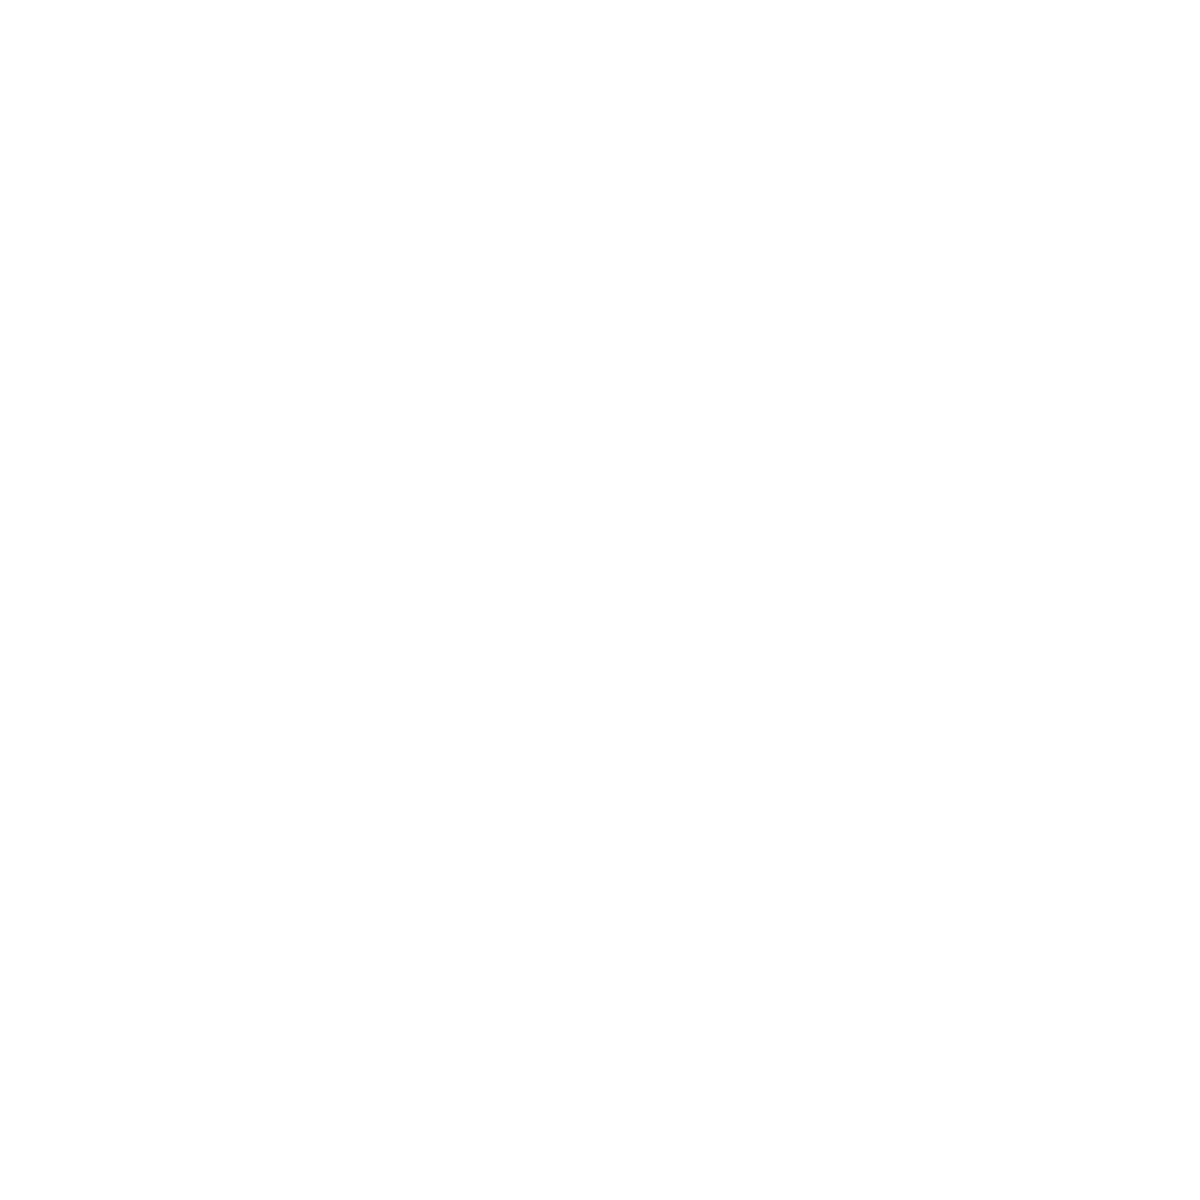 Xforce Keygen 64 Bits 3ds Max 2014